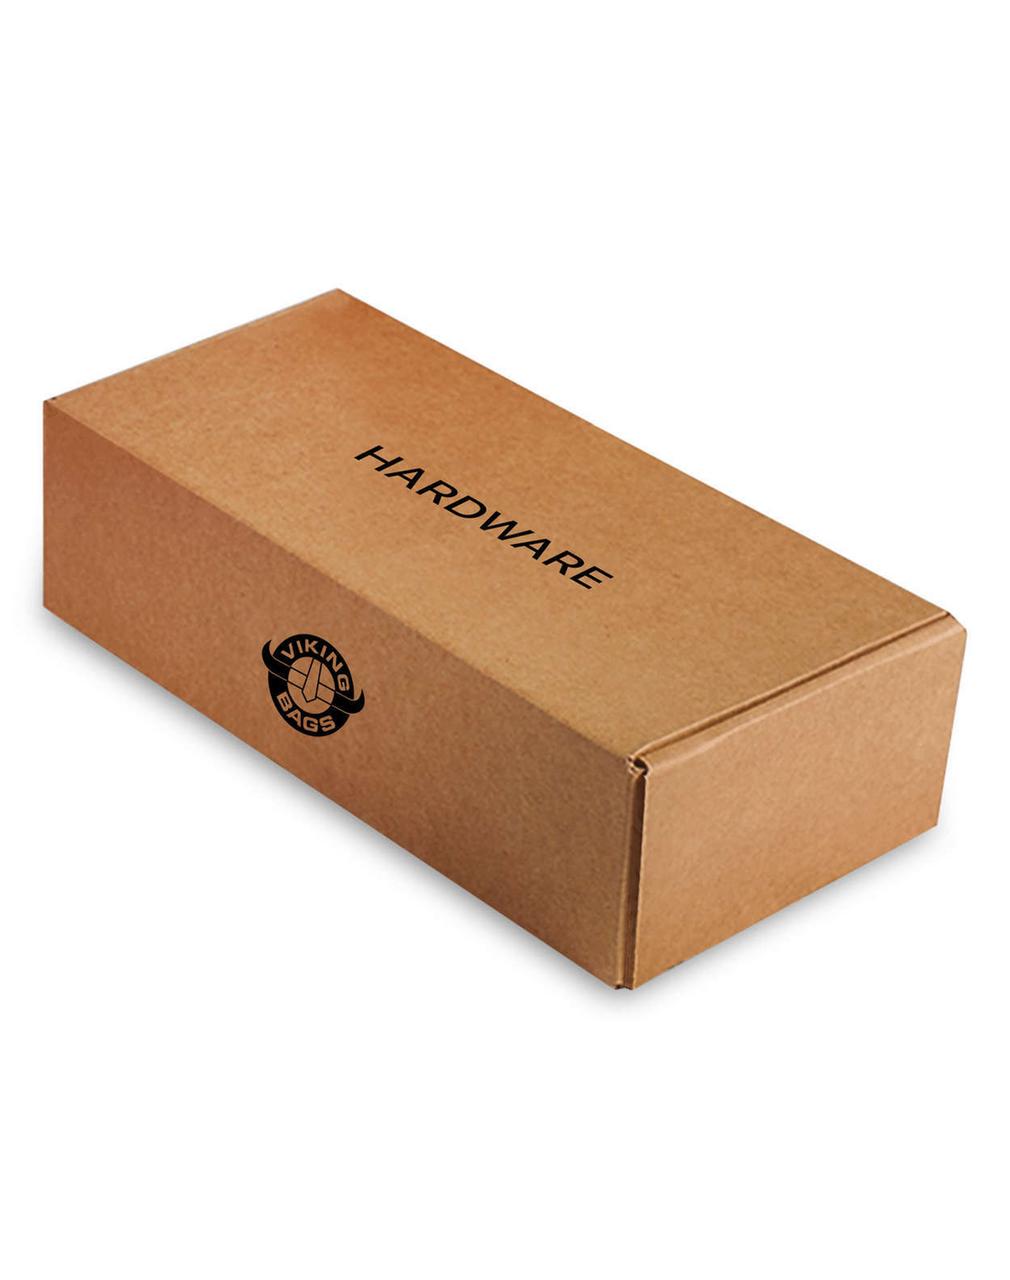 Honda 1500 Valkyrie Interstate Charger Medium Single Strap Studded Motorcycle Saddlebags Hardware Box